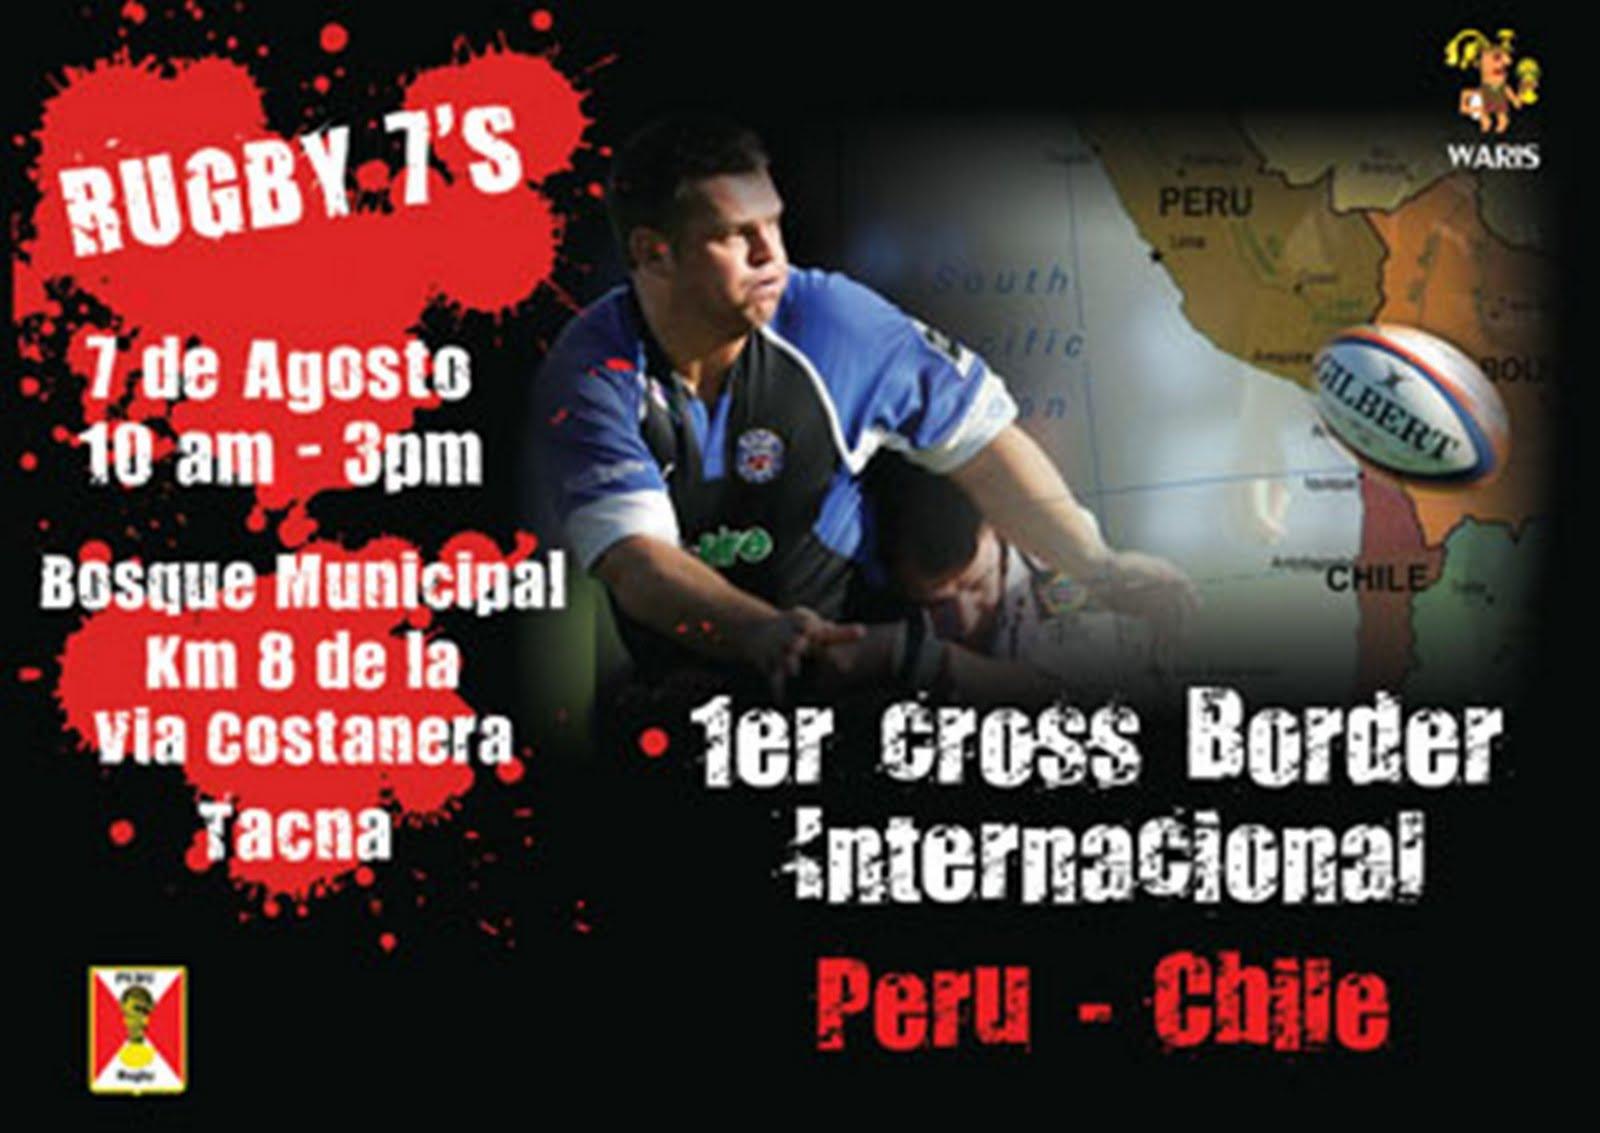 RUGBY Waris viajan a Tacna para enfrentar a Chile